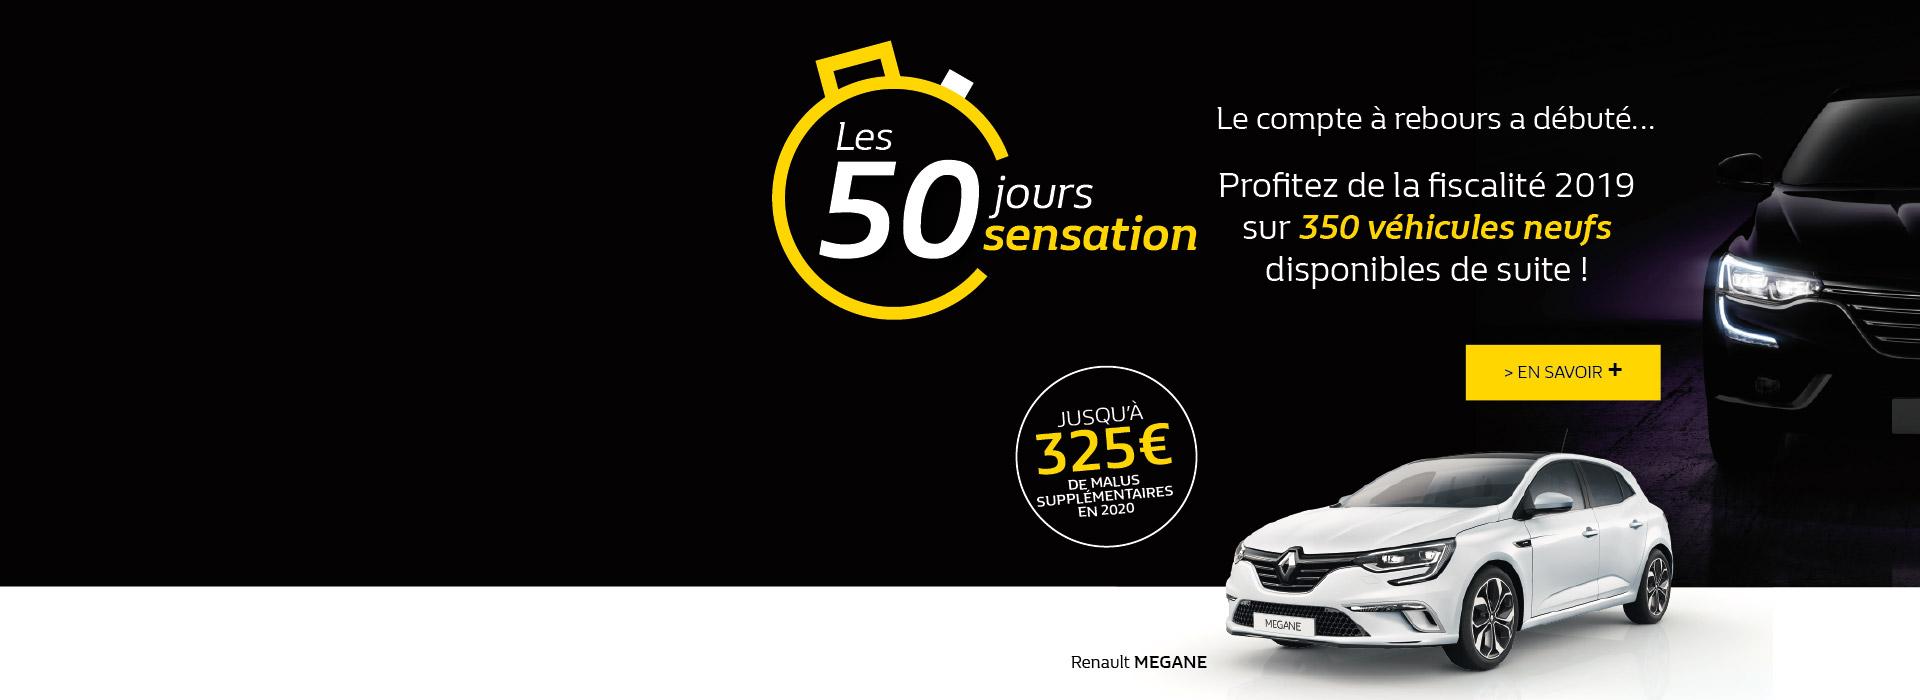 Garage Renault 77